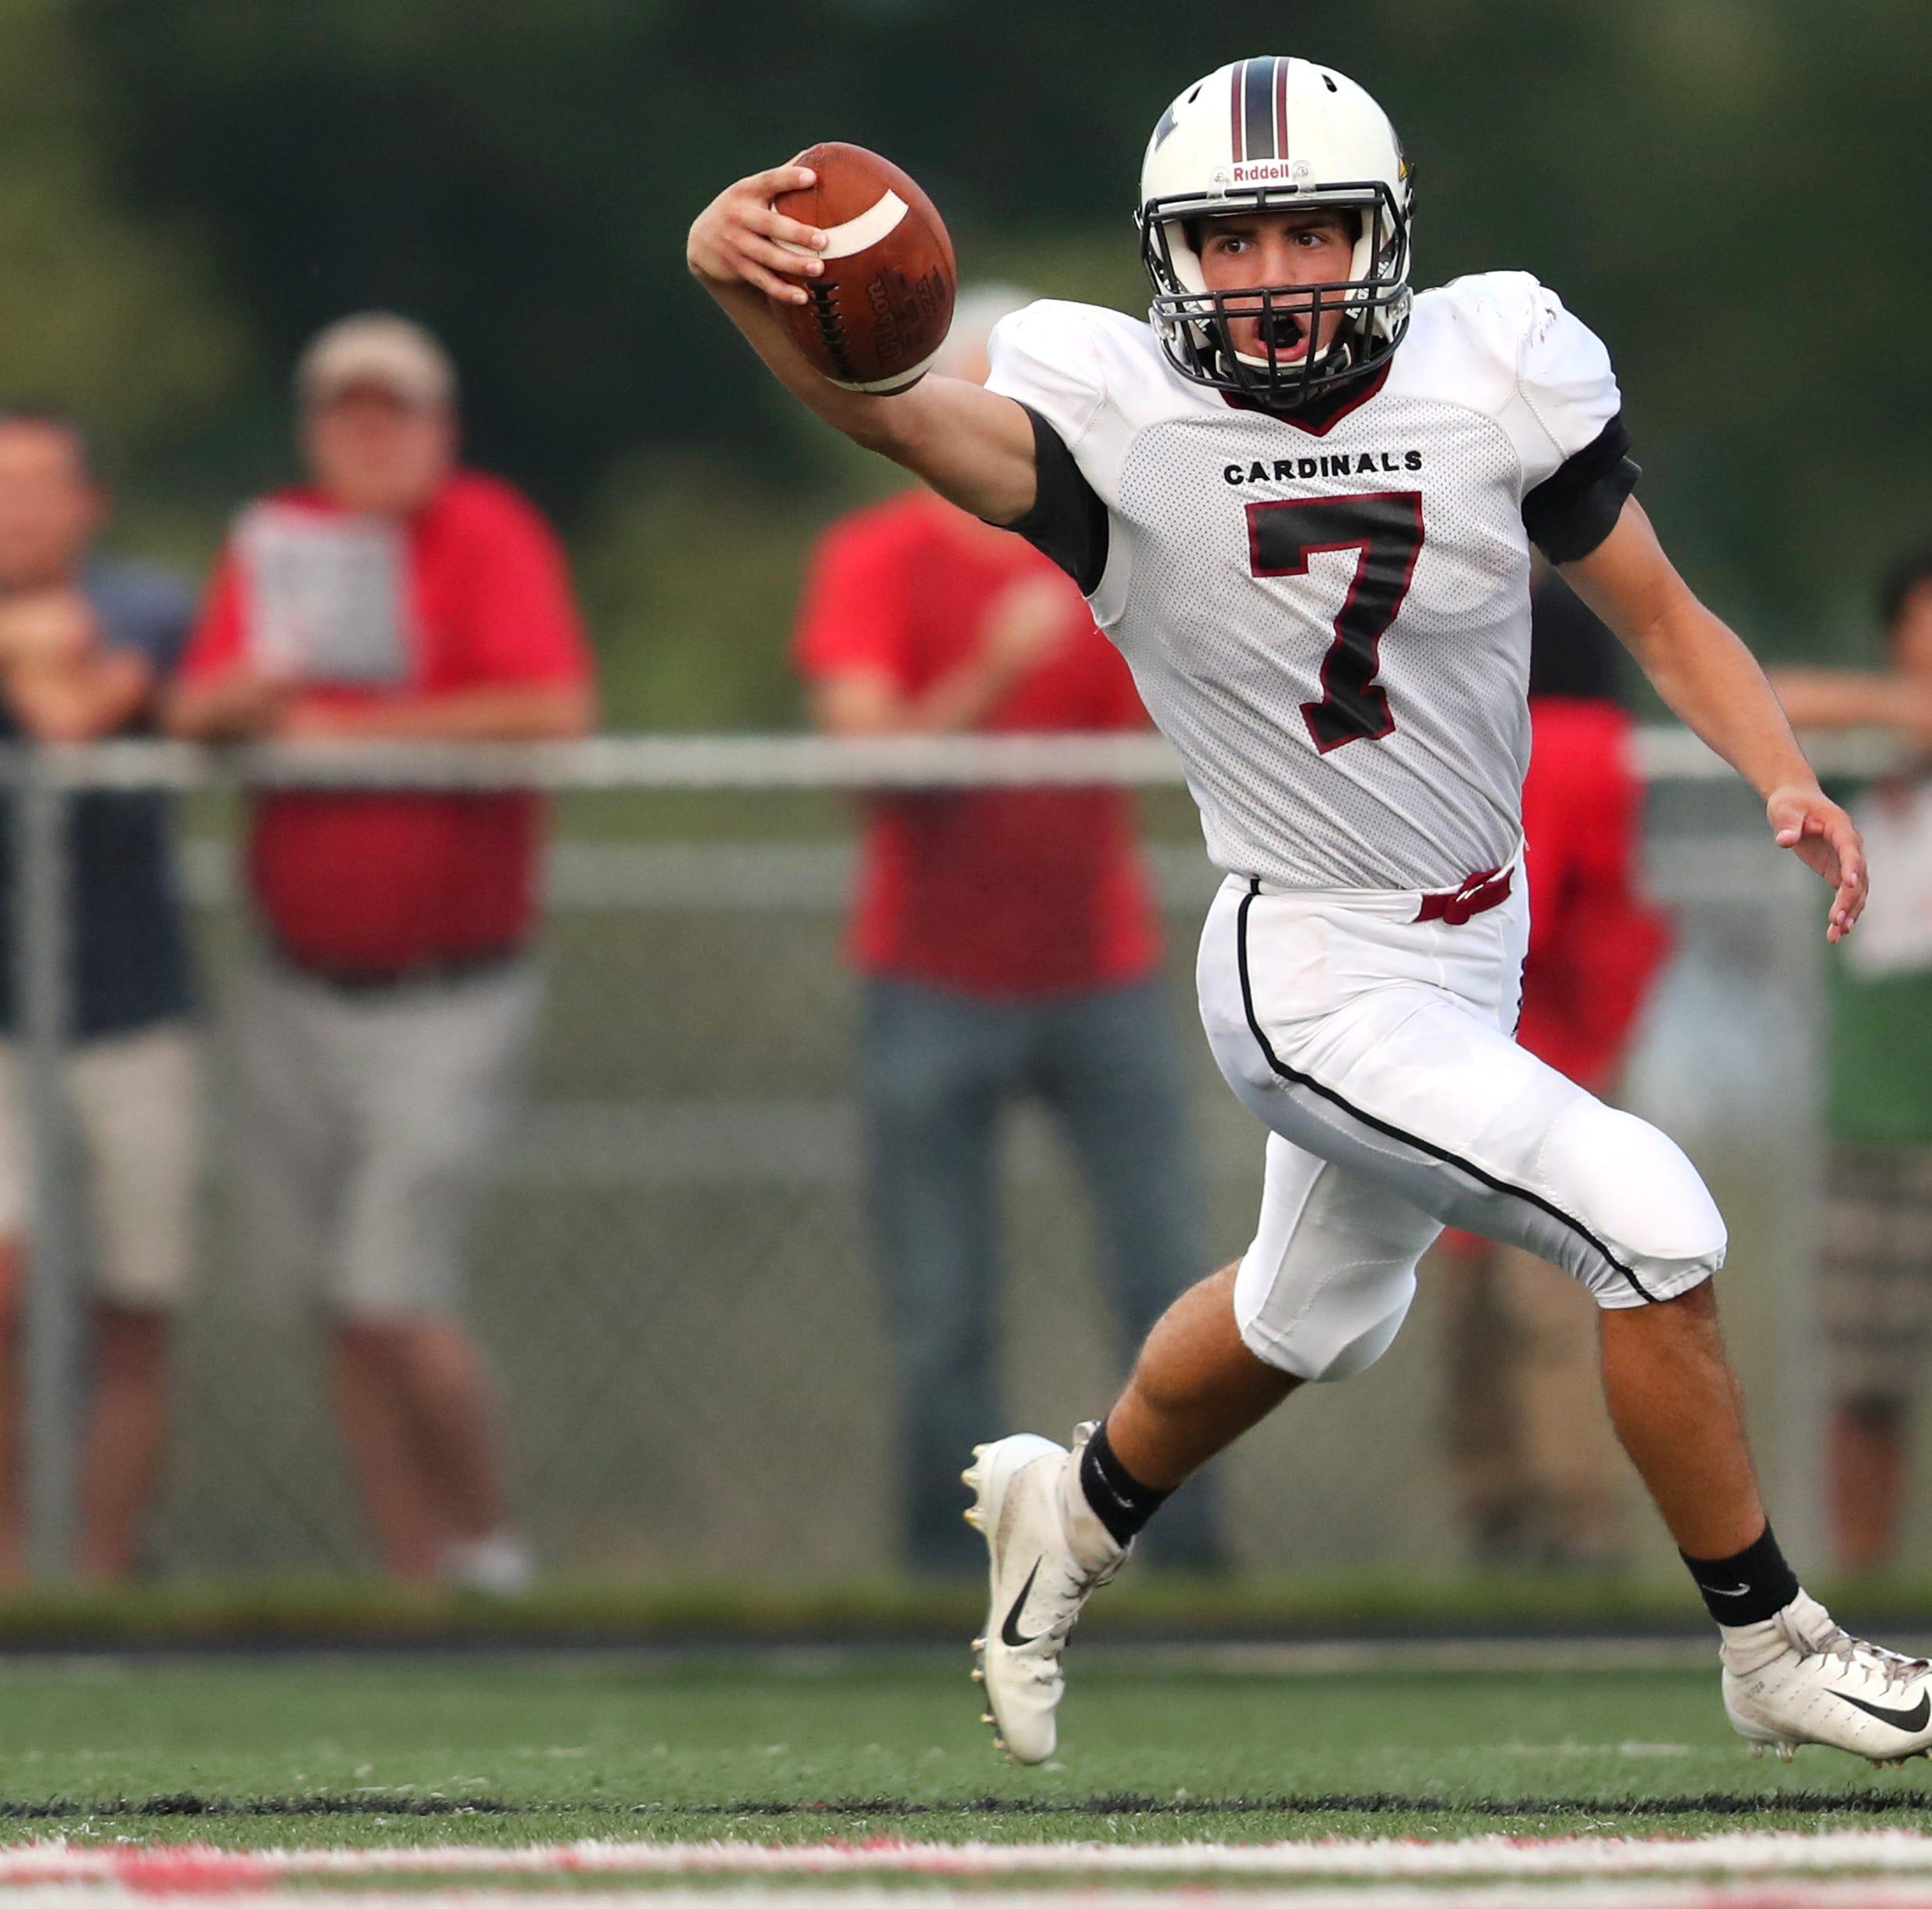 High school football: Kimberly's historic winning streak ends at 70